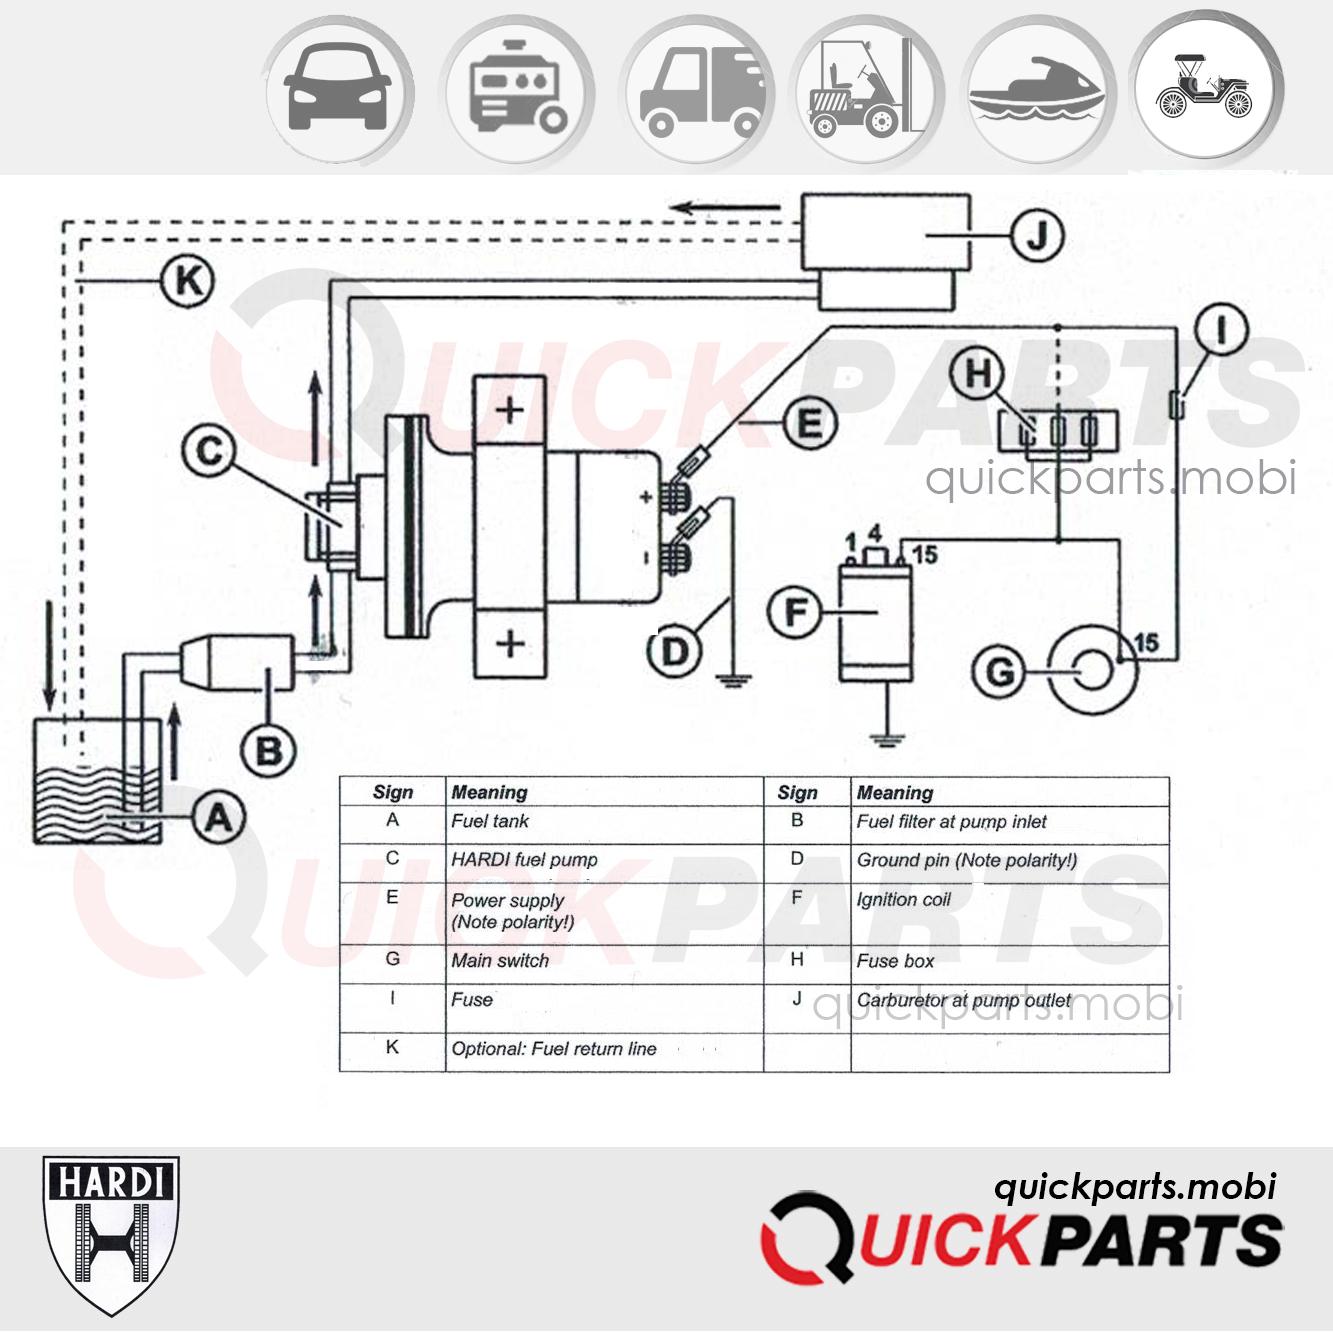 universal electrical fuel pump 12v | 60-80l/h | hardi 13312